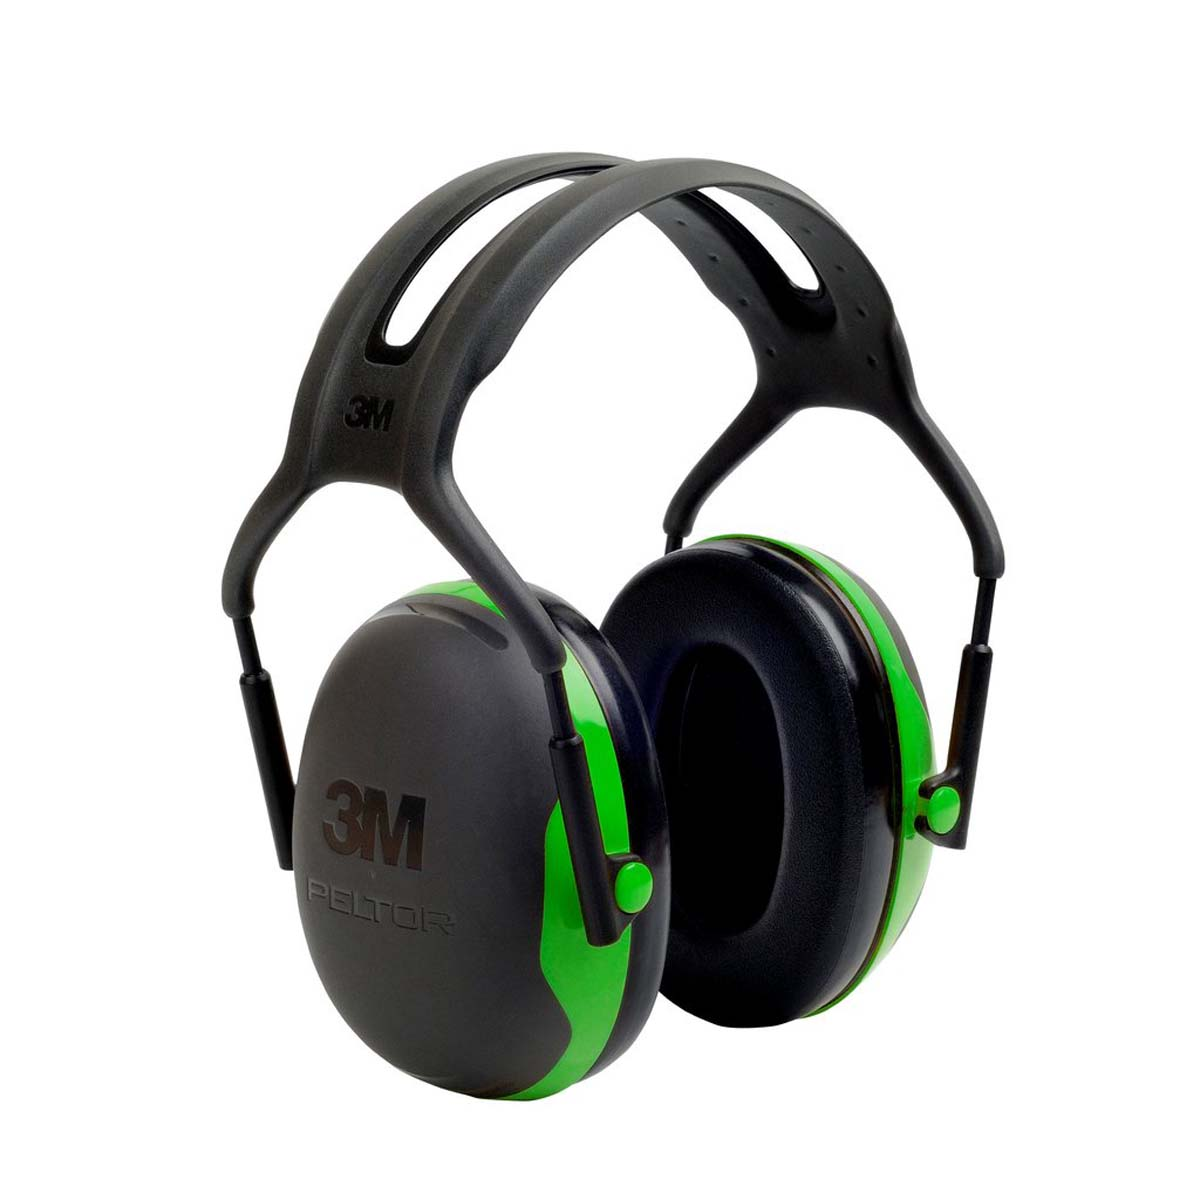 "3Mâ""¢ PELTORâ""¢ Over-the-Head Earmuffs X1A/37270(AAD)"